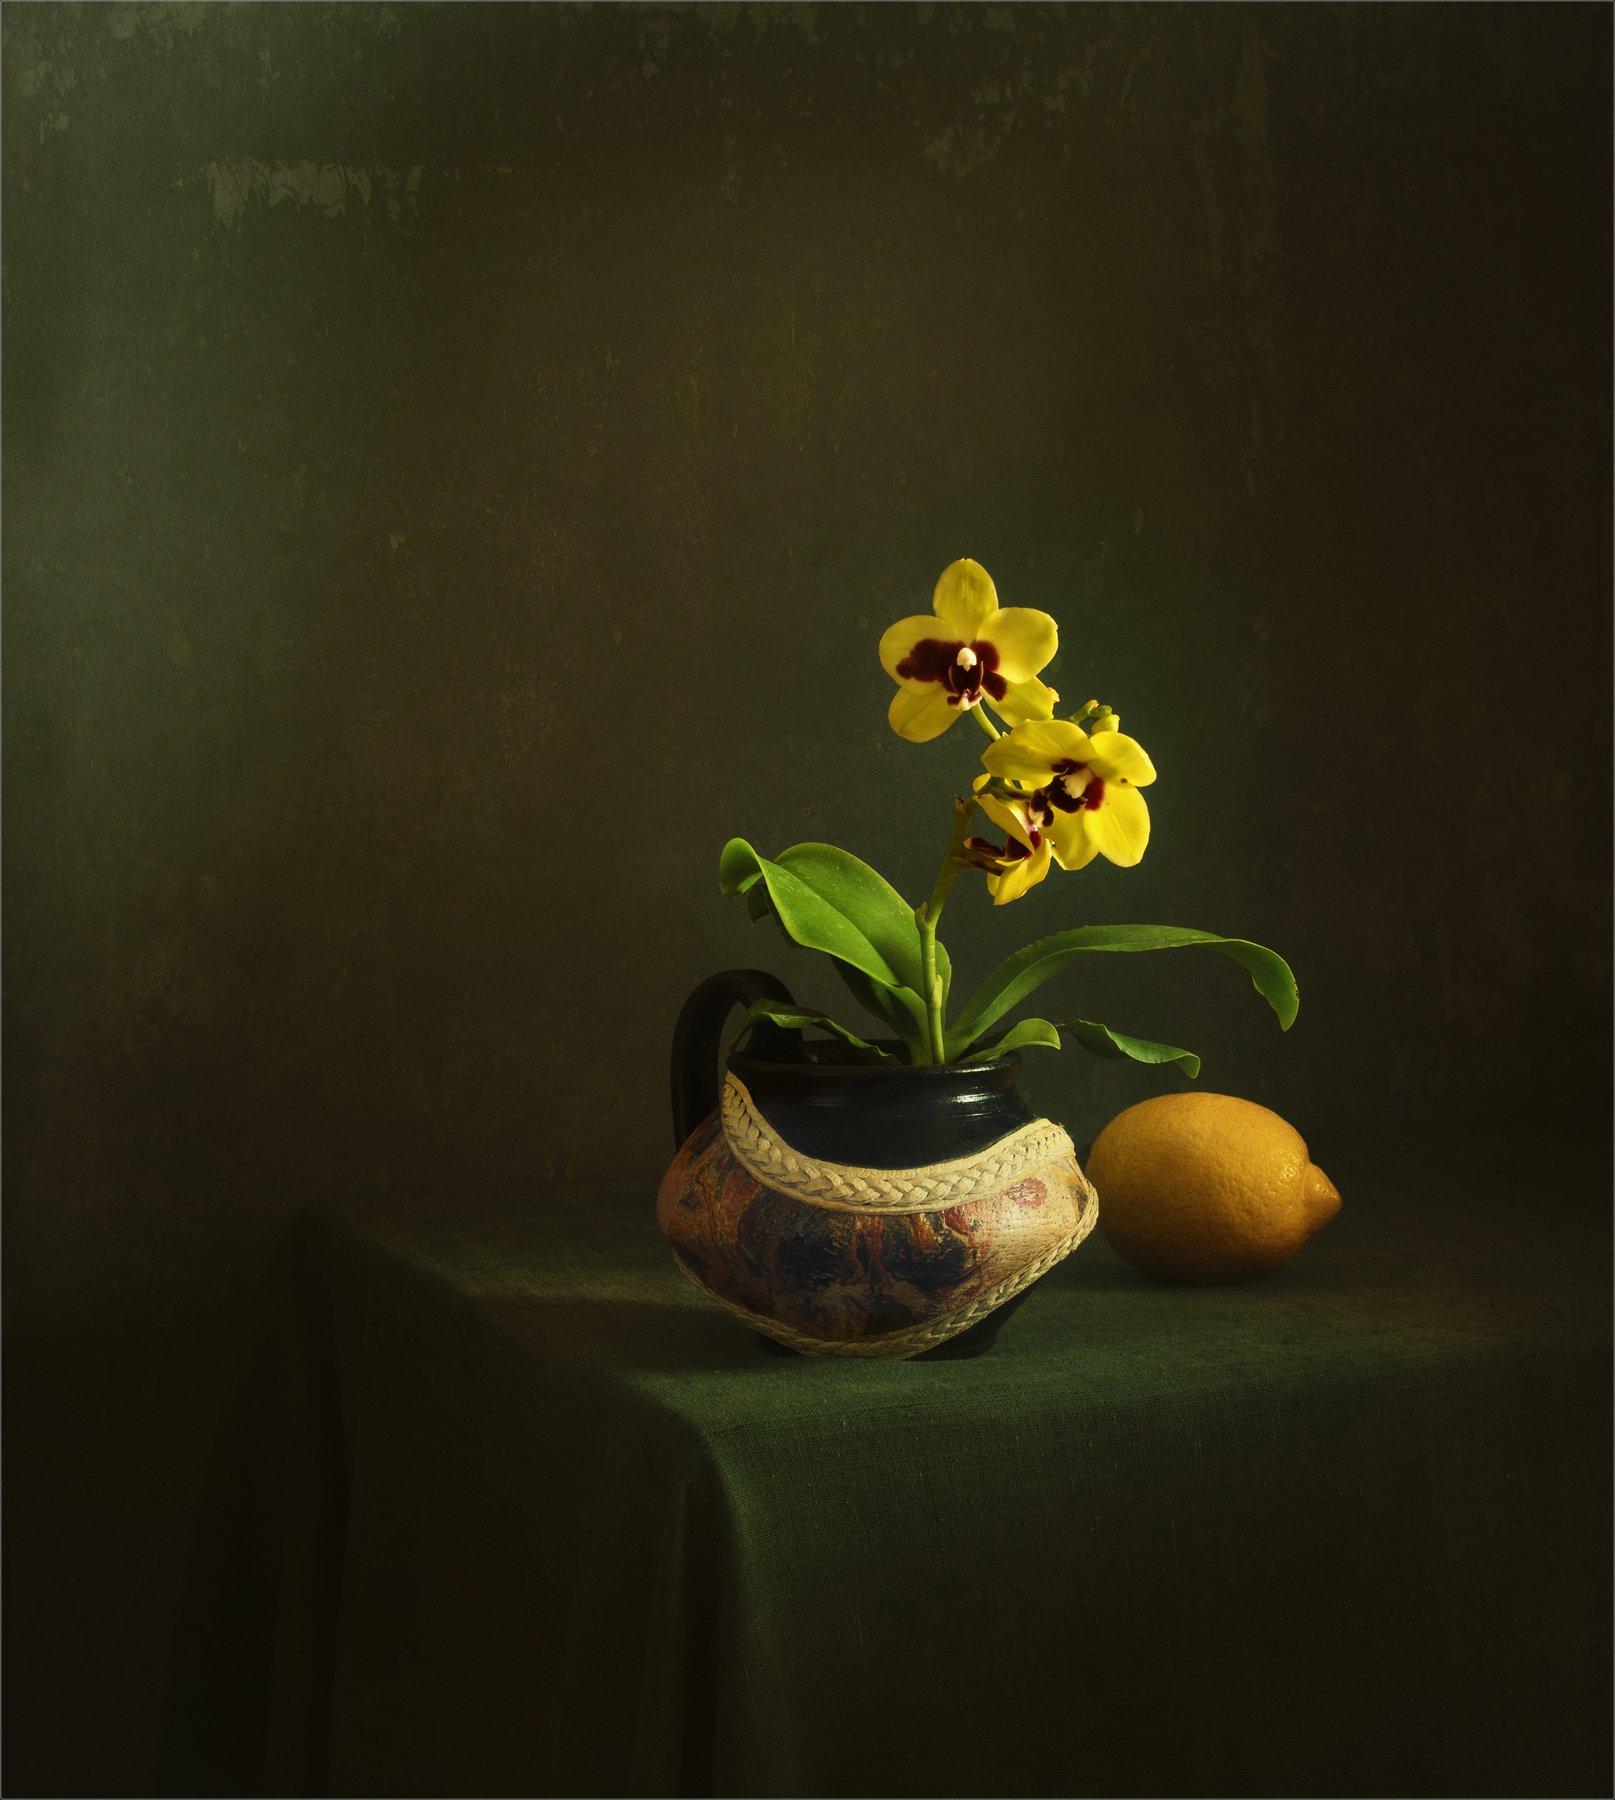 still life, натюрморт,    растение, природа,  винтаж, , цветы, орхидея ,  минимализм, лимон, цитрус, еда, ретро, Михаил MSH